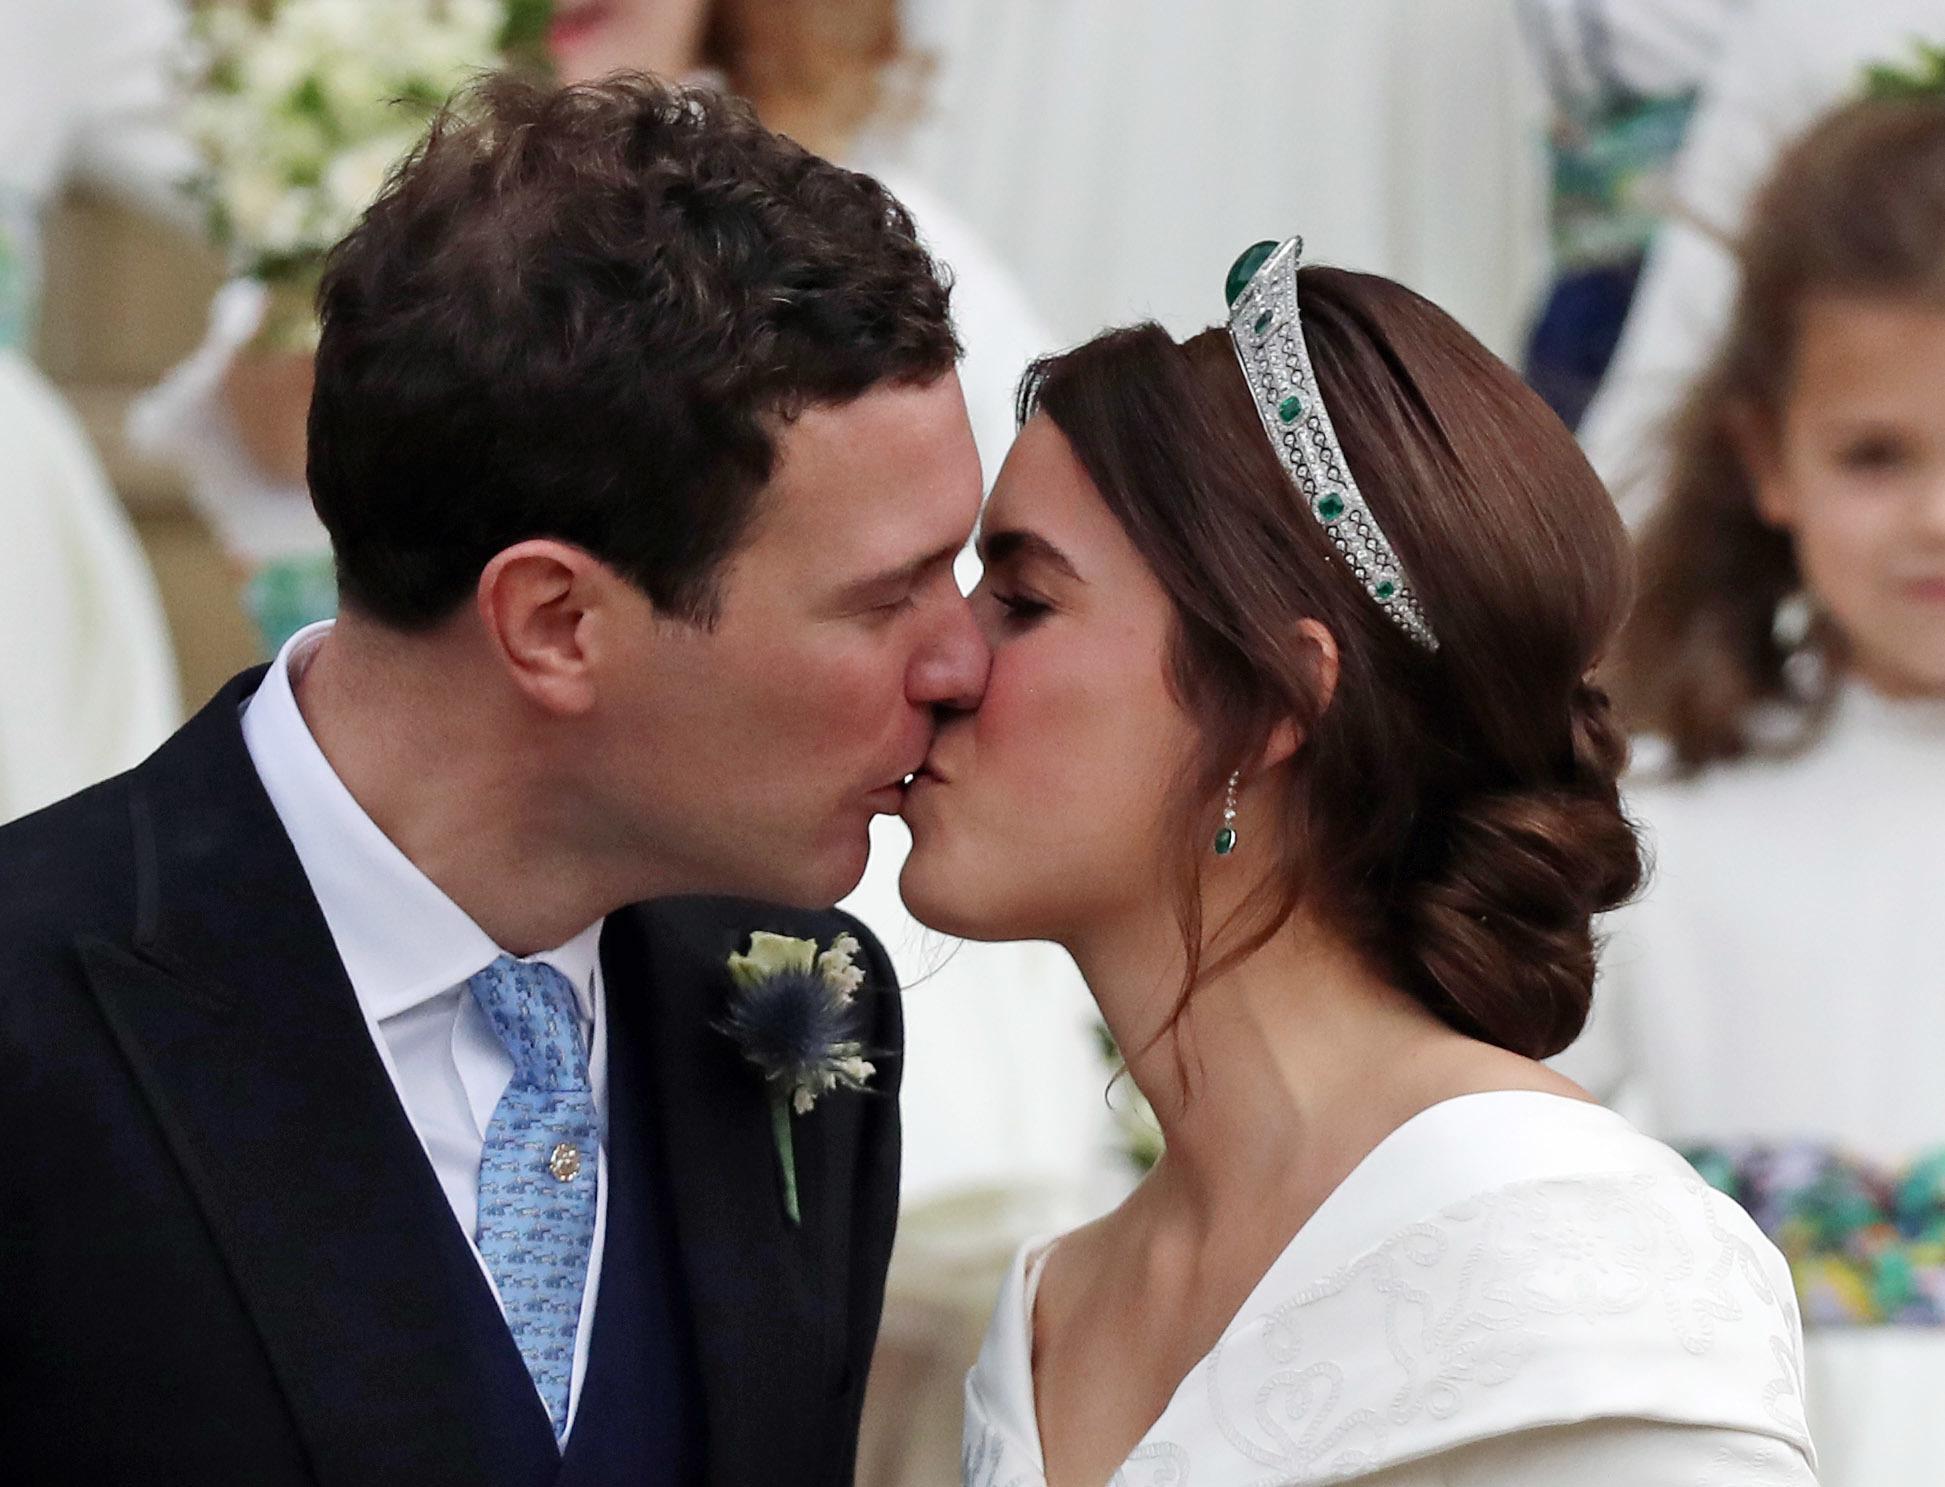 WINDSOR, ENGLAND - OCTOBER 12: Princess Eugenie of York and her husband Jack Brooksbank kiss on the steps...